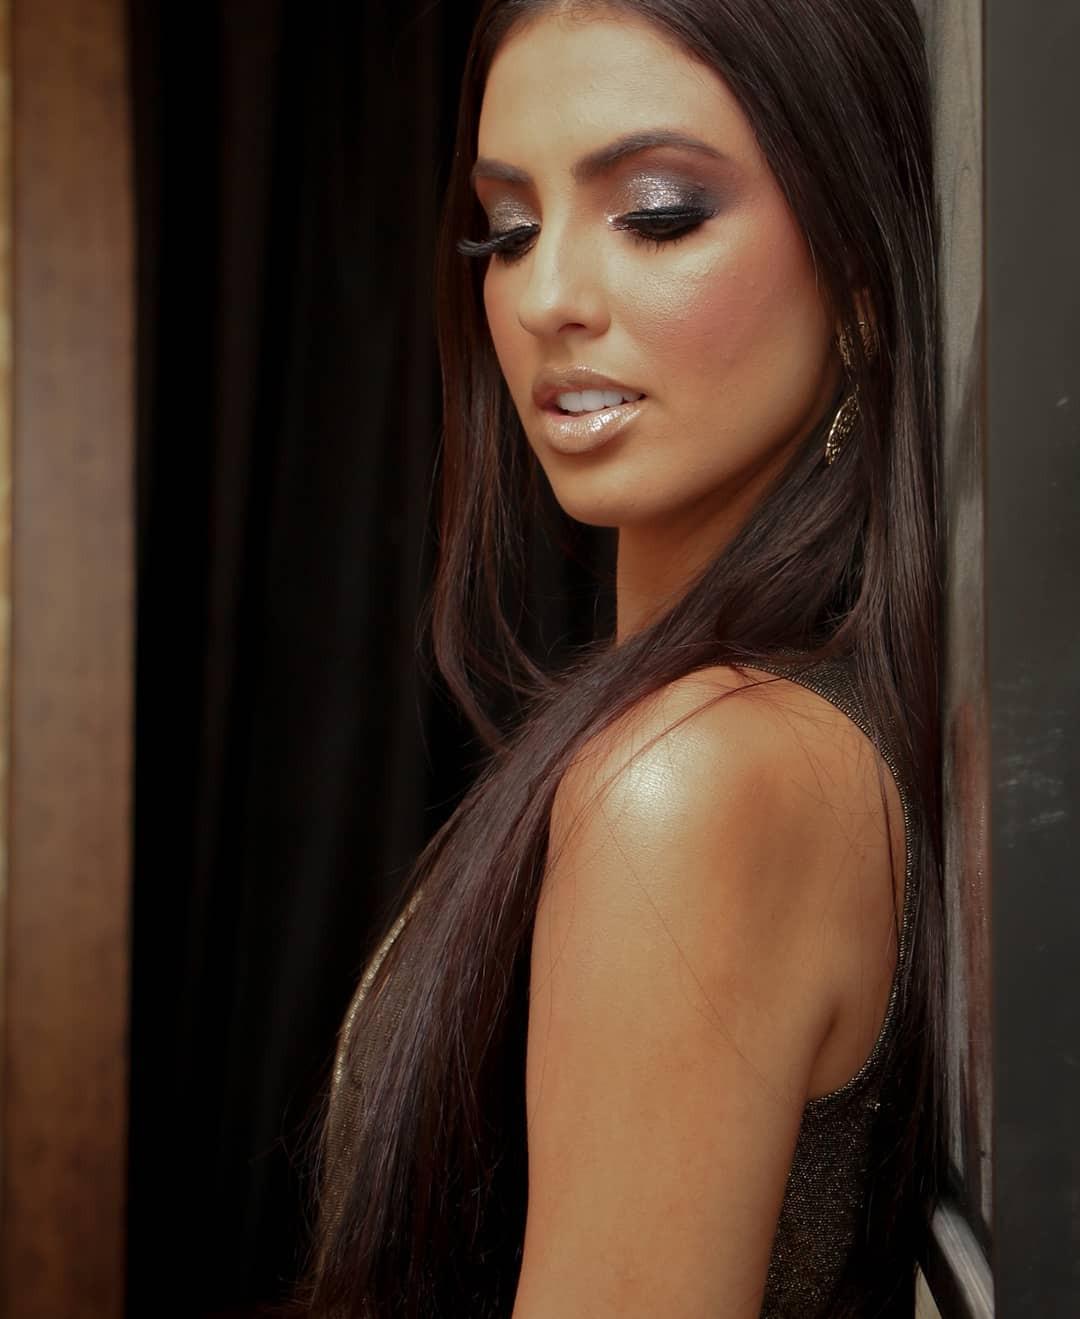 cristielli camargo, miss brasil mesoamerica 2021/top 13 de miss supranational brazil 2020/top 21 de miss brasil mundo 2018. - Página 5 Bzmnnv10